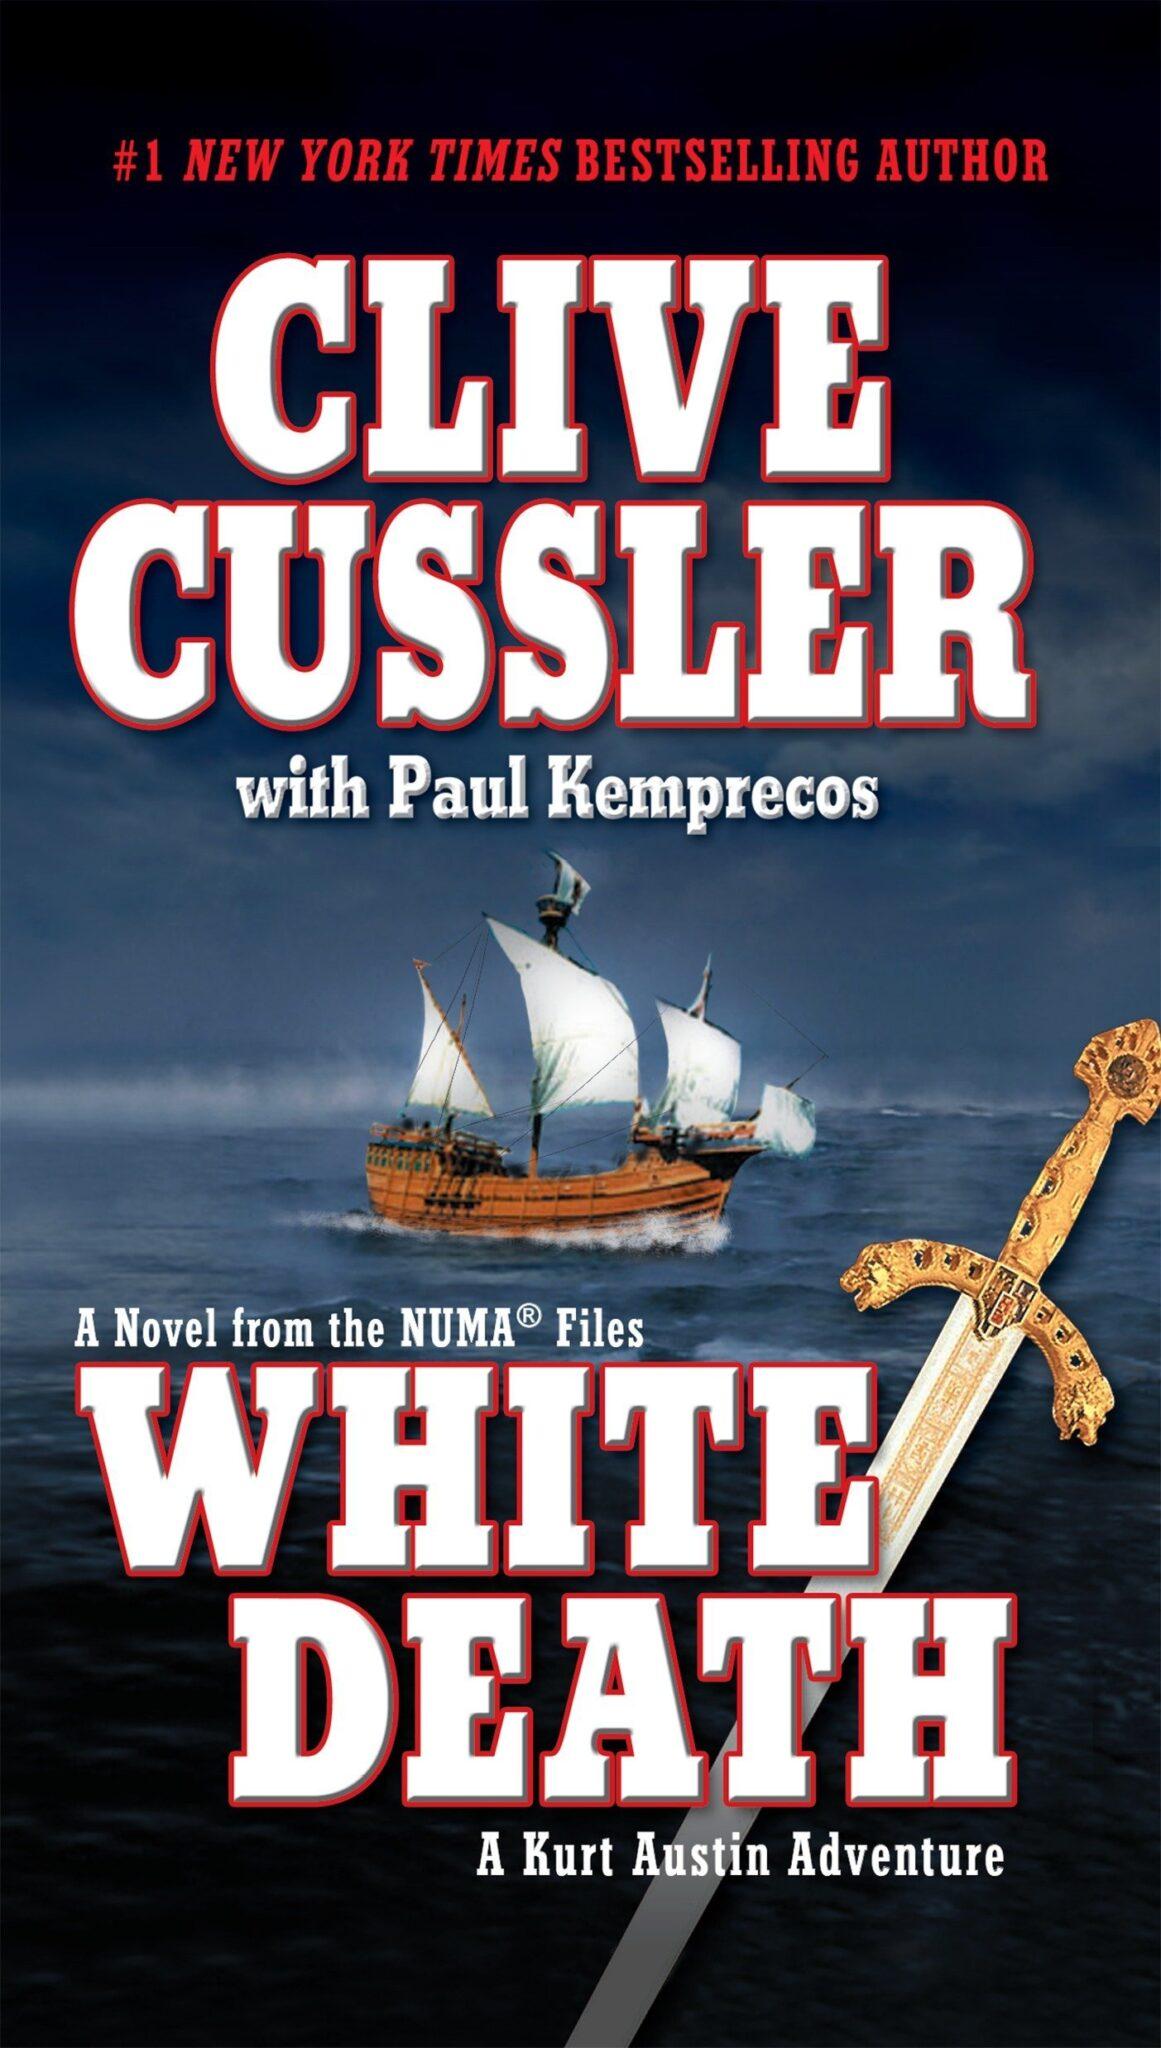 Clive Cussler books 23